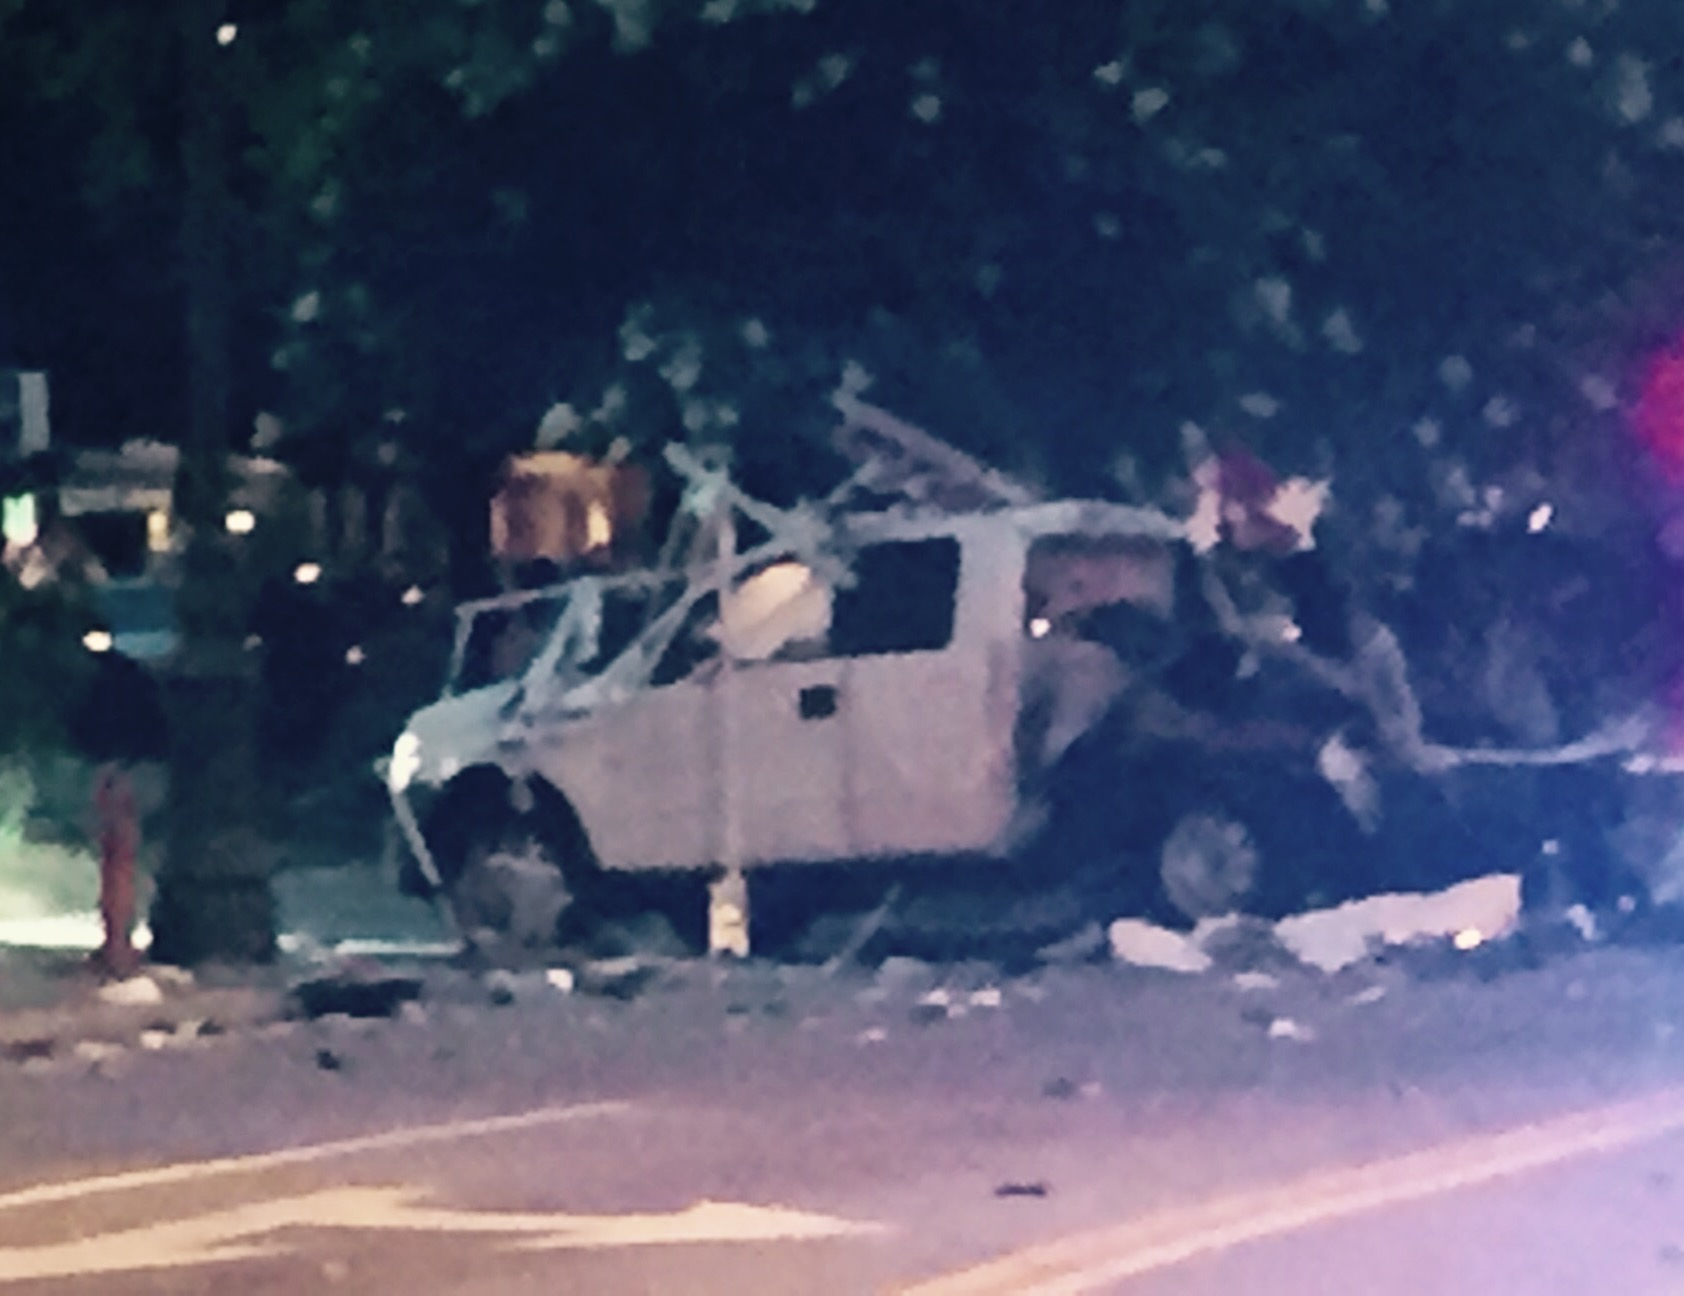 Truck Explosion in Franklin Square_17066